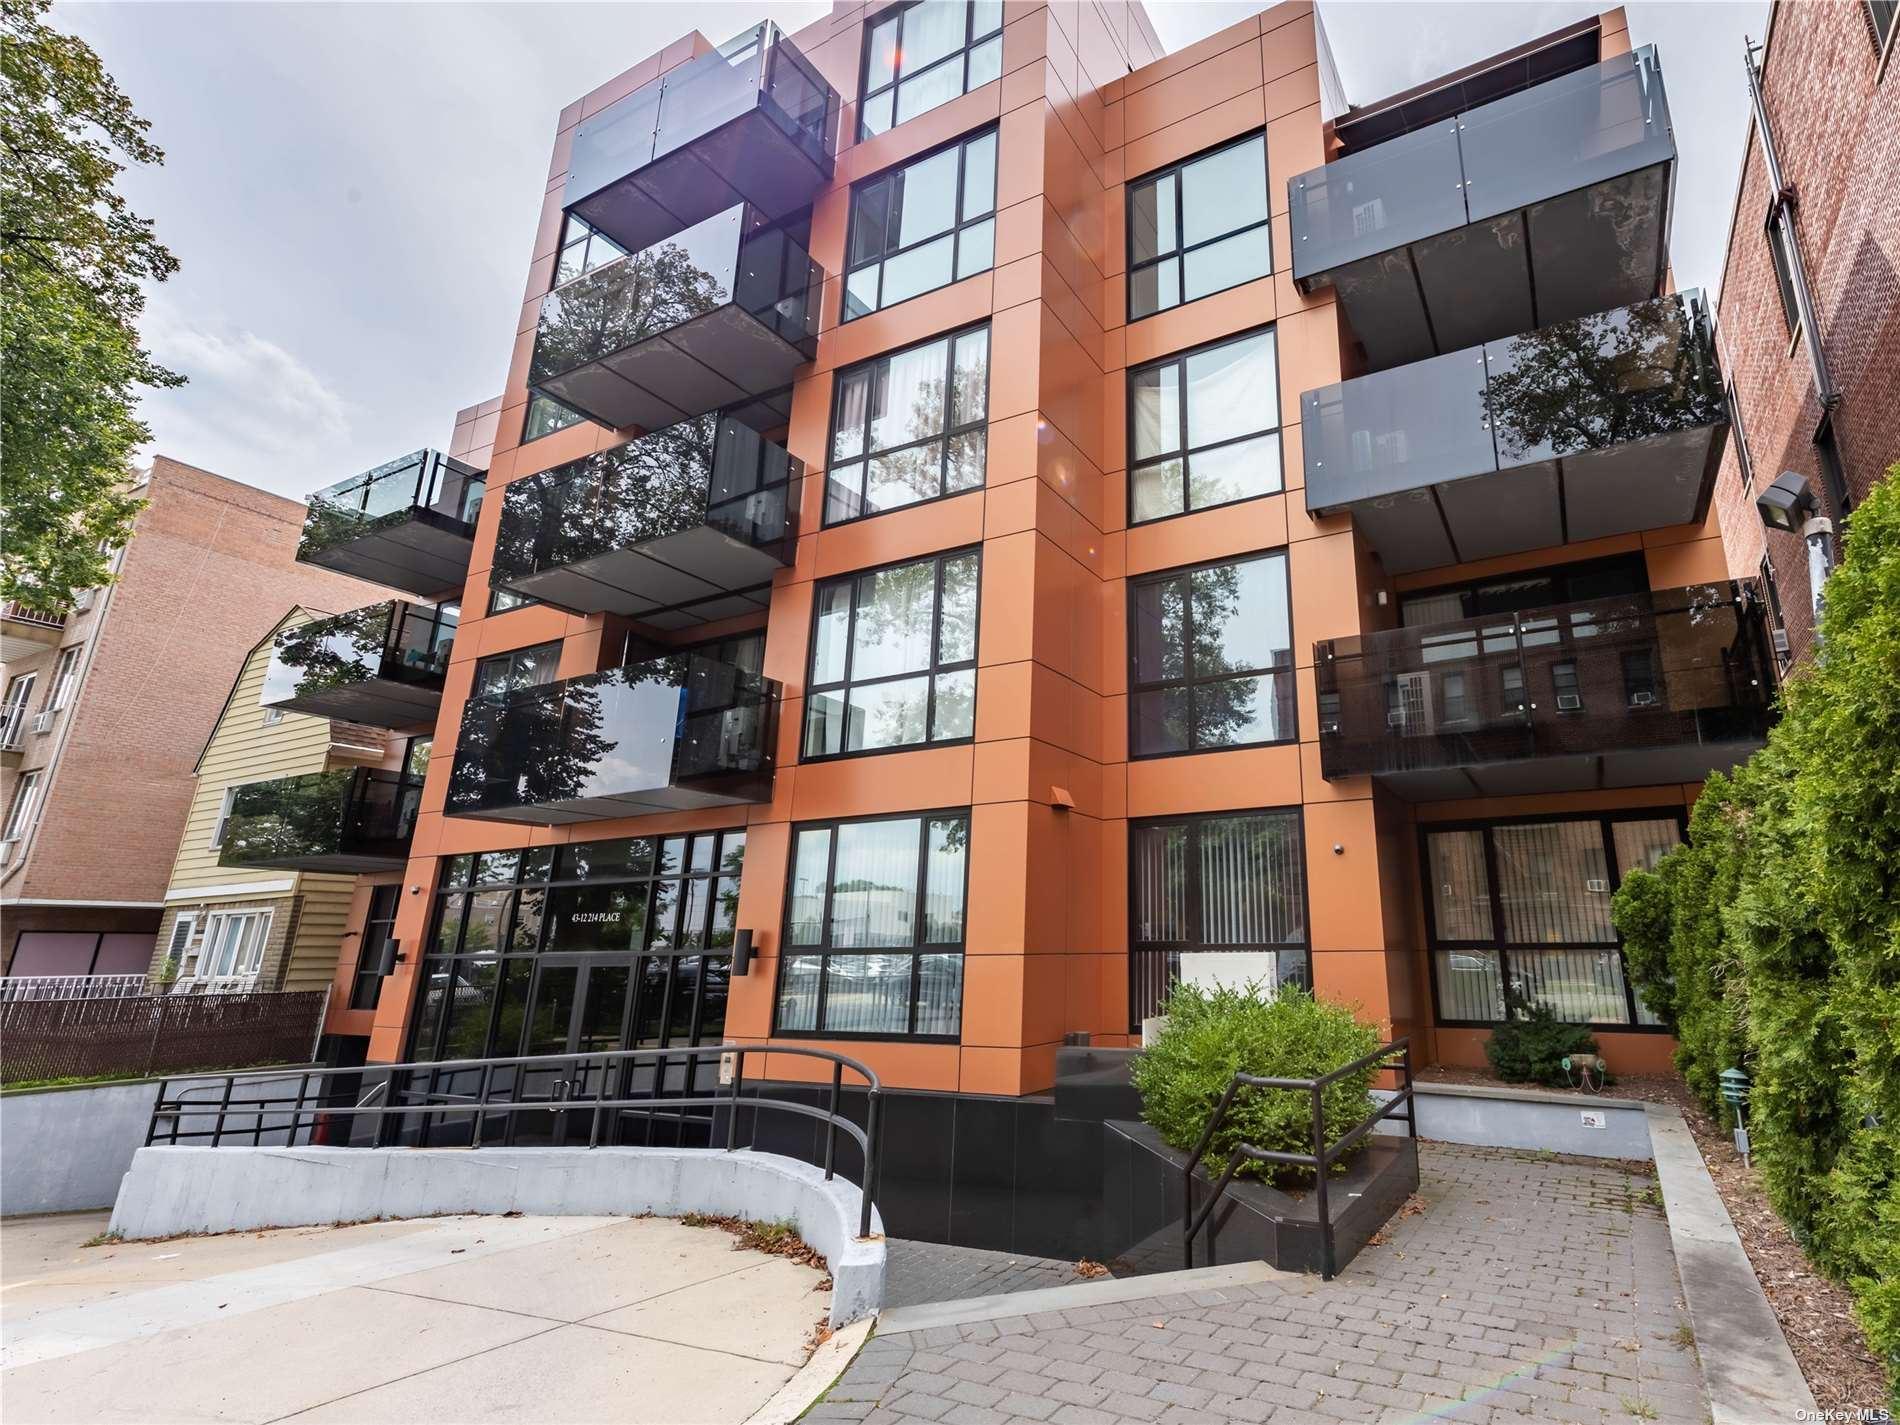 43-12 214th Place #1A, Bayside, NY 11361 - MLS#: 3348271